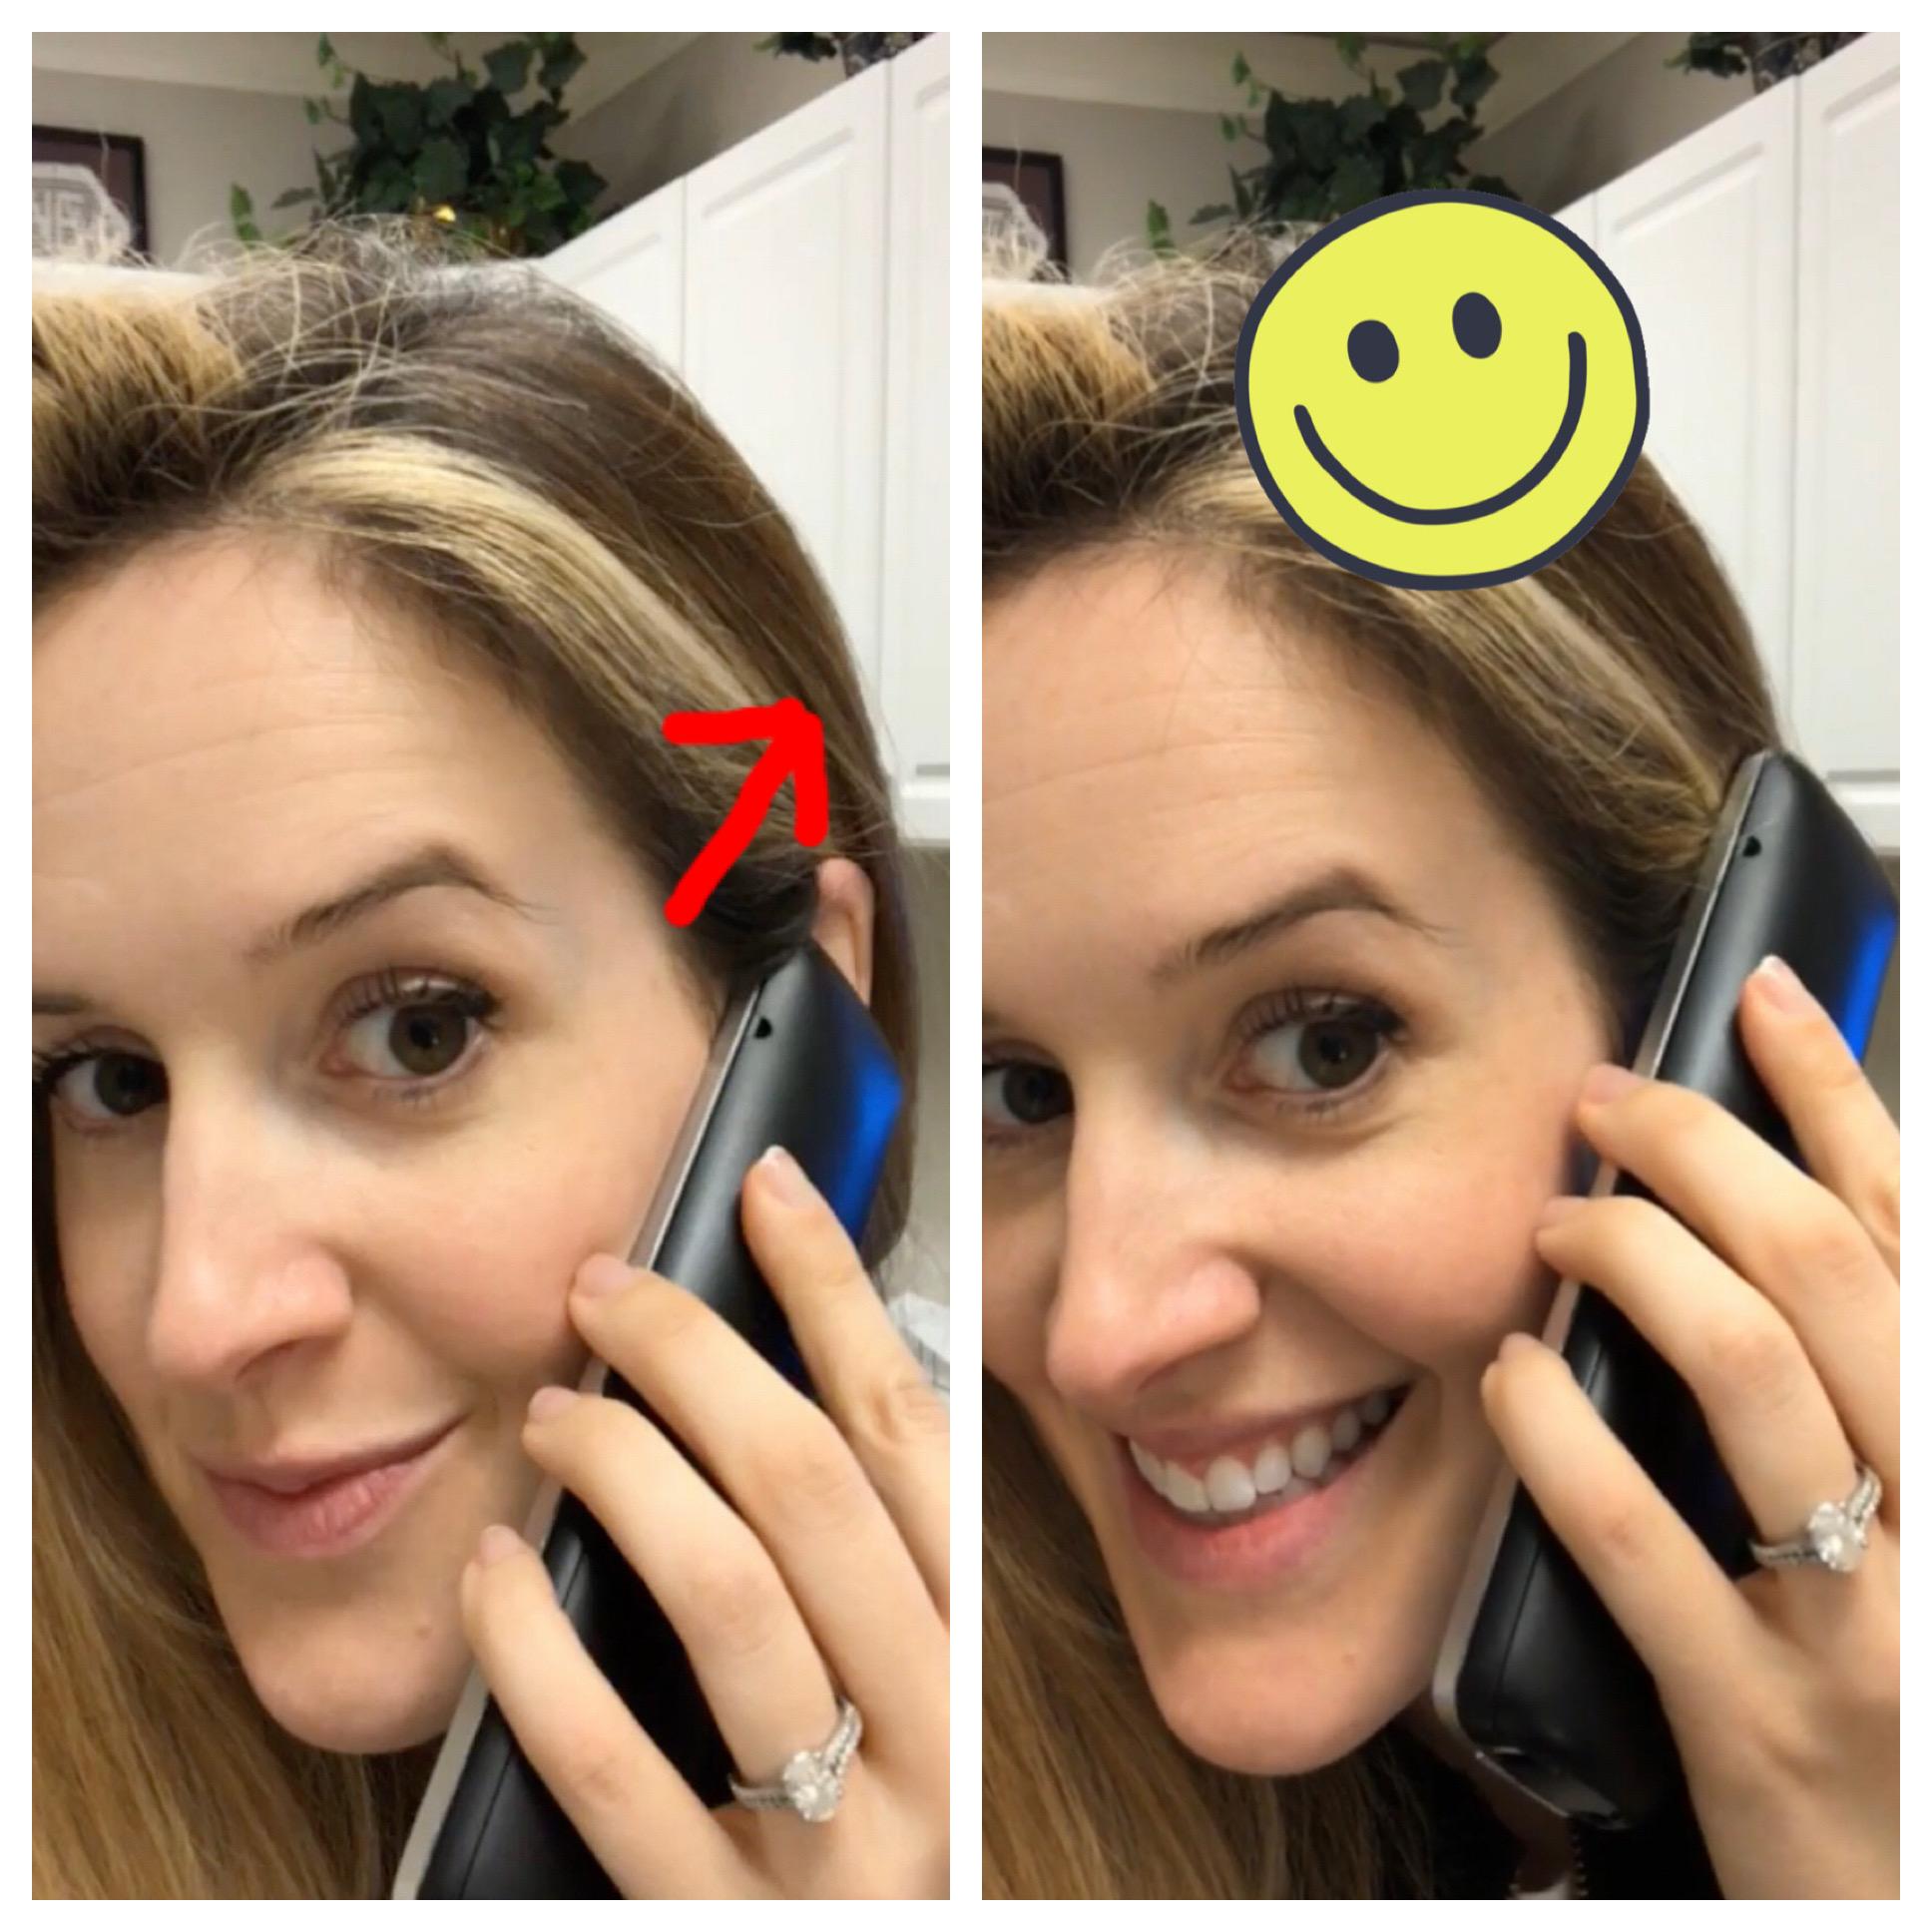 Madison Levine hearing aids